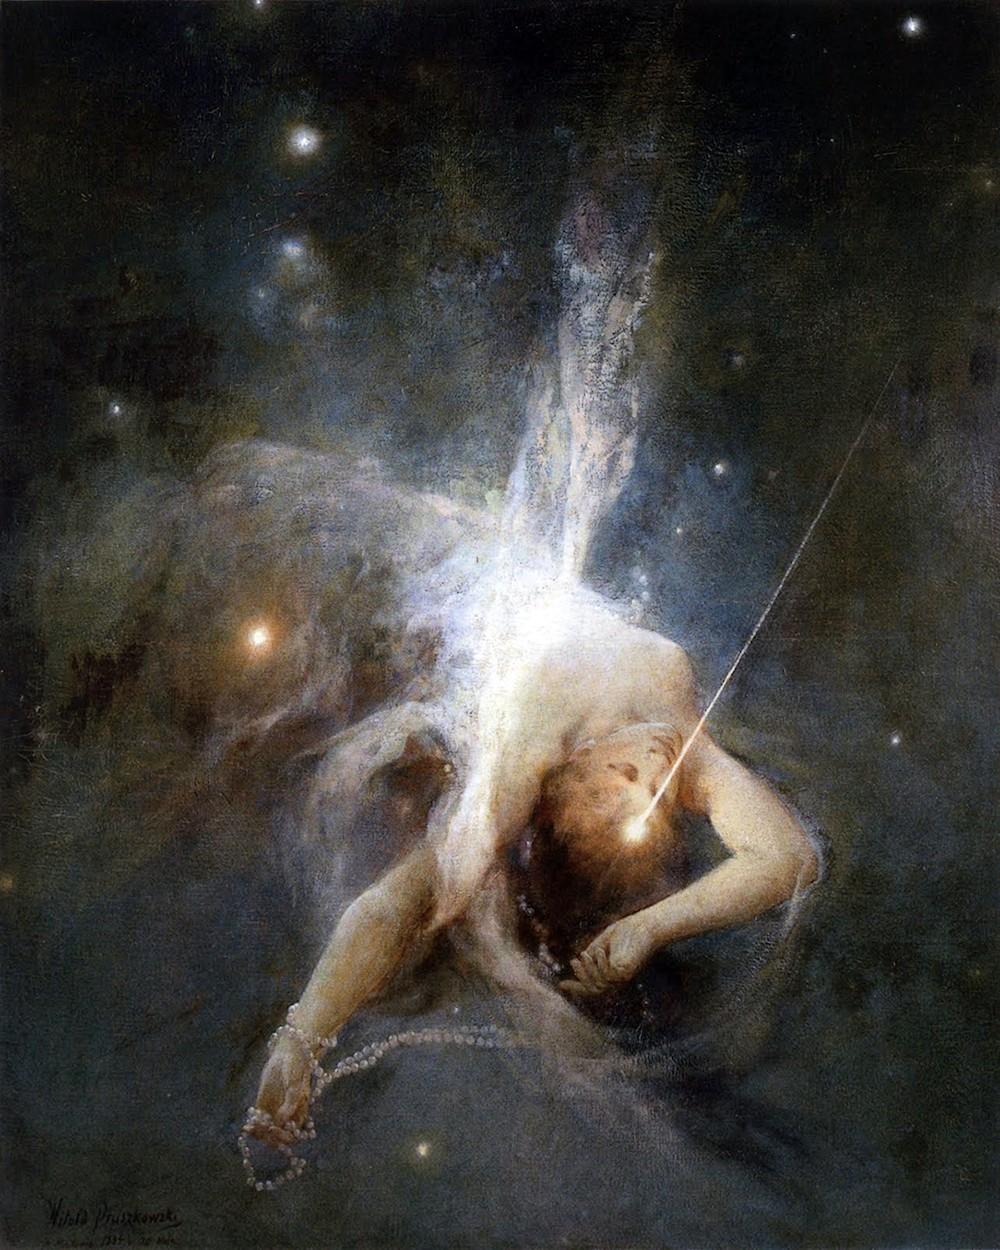 00 Witold Pruszkowski. Falling Star. 1884